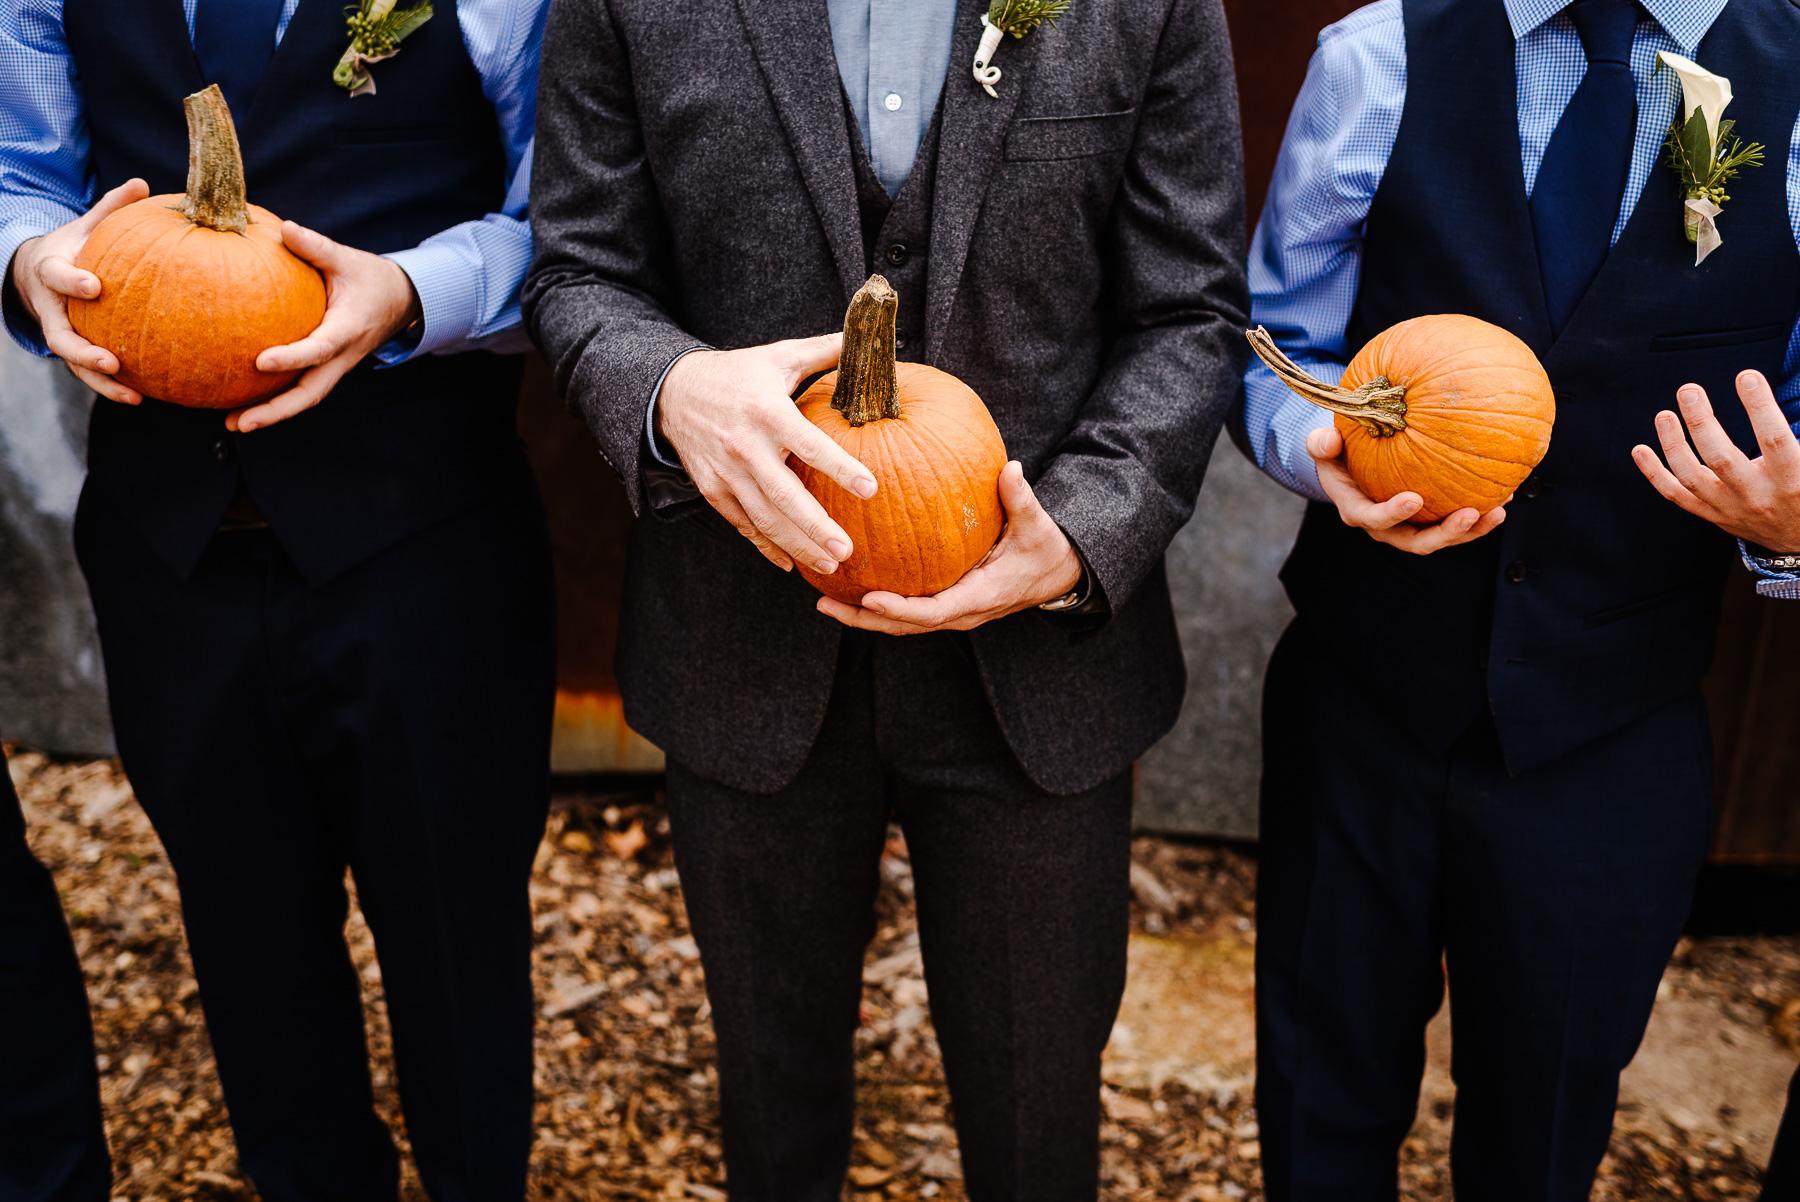 58-Laurita Winery Wedding New Jersey Wedding Photographer Laurita Winery Weddings Longbrook Photography.jpg